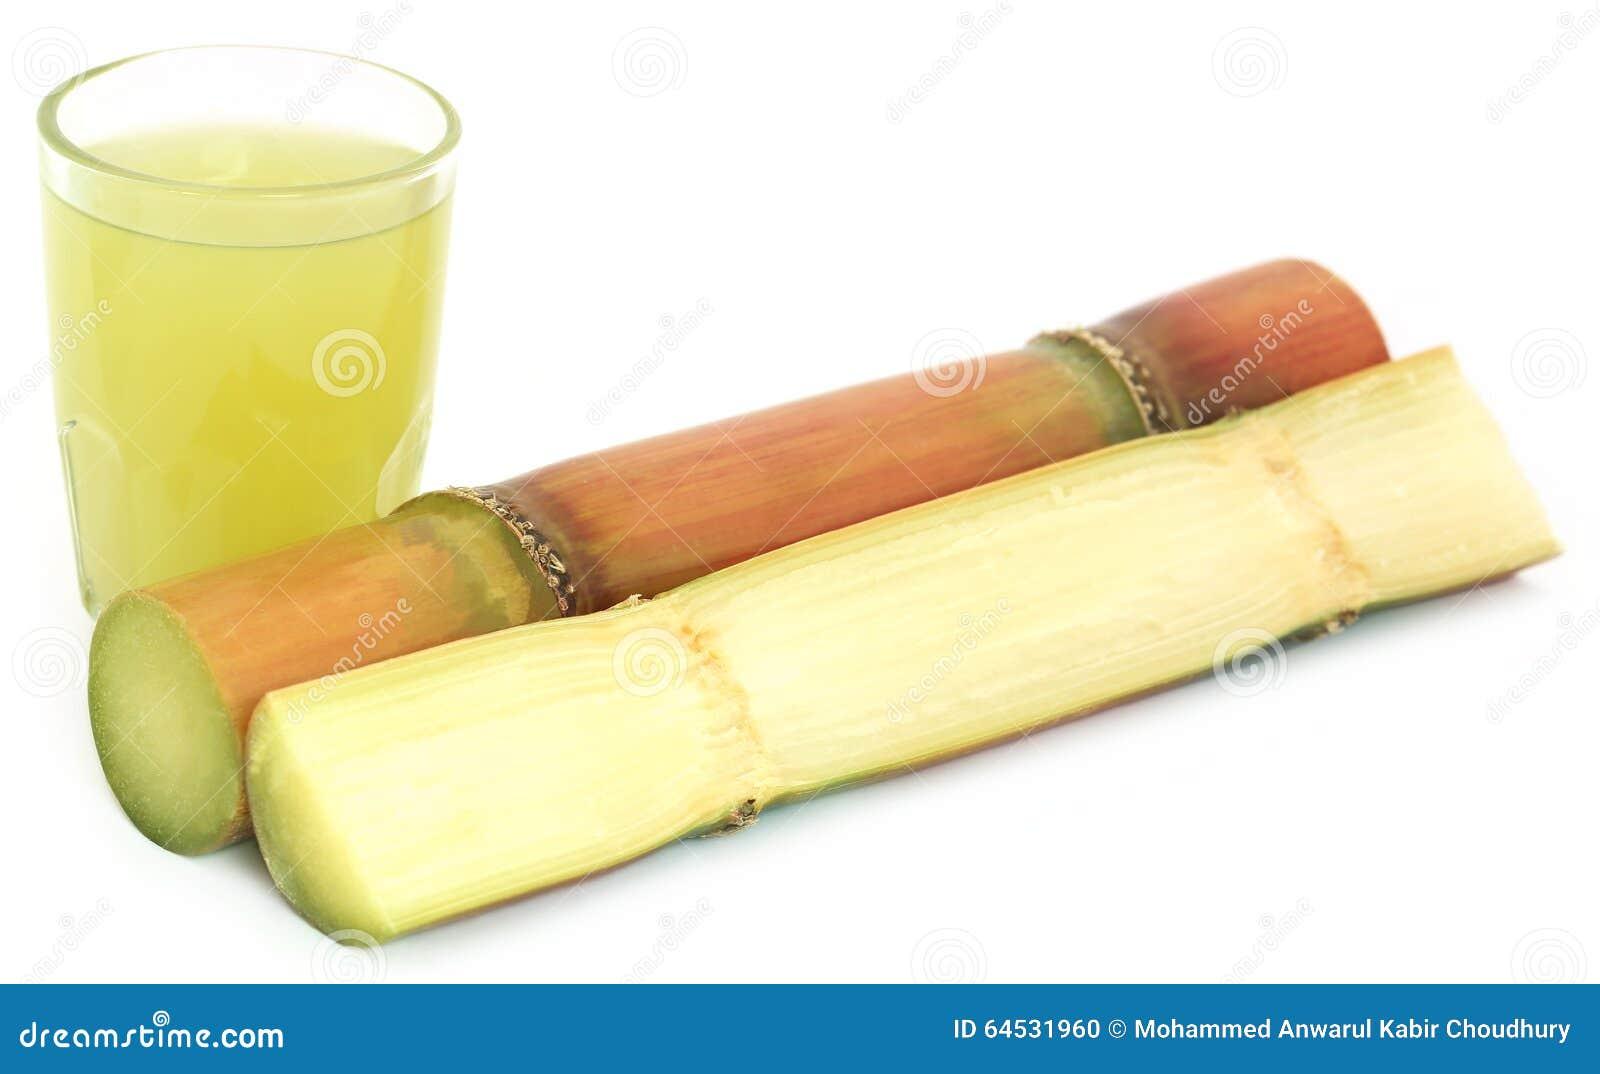 Sugarcane juice preservation pdf